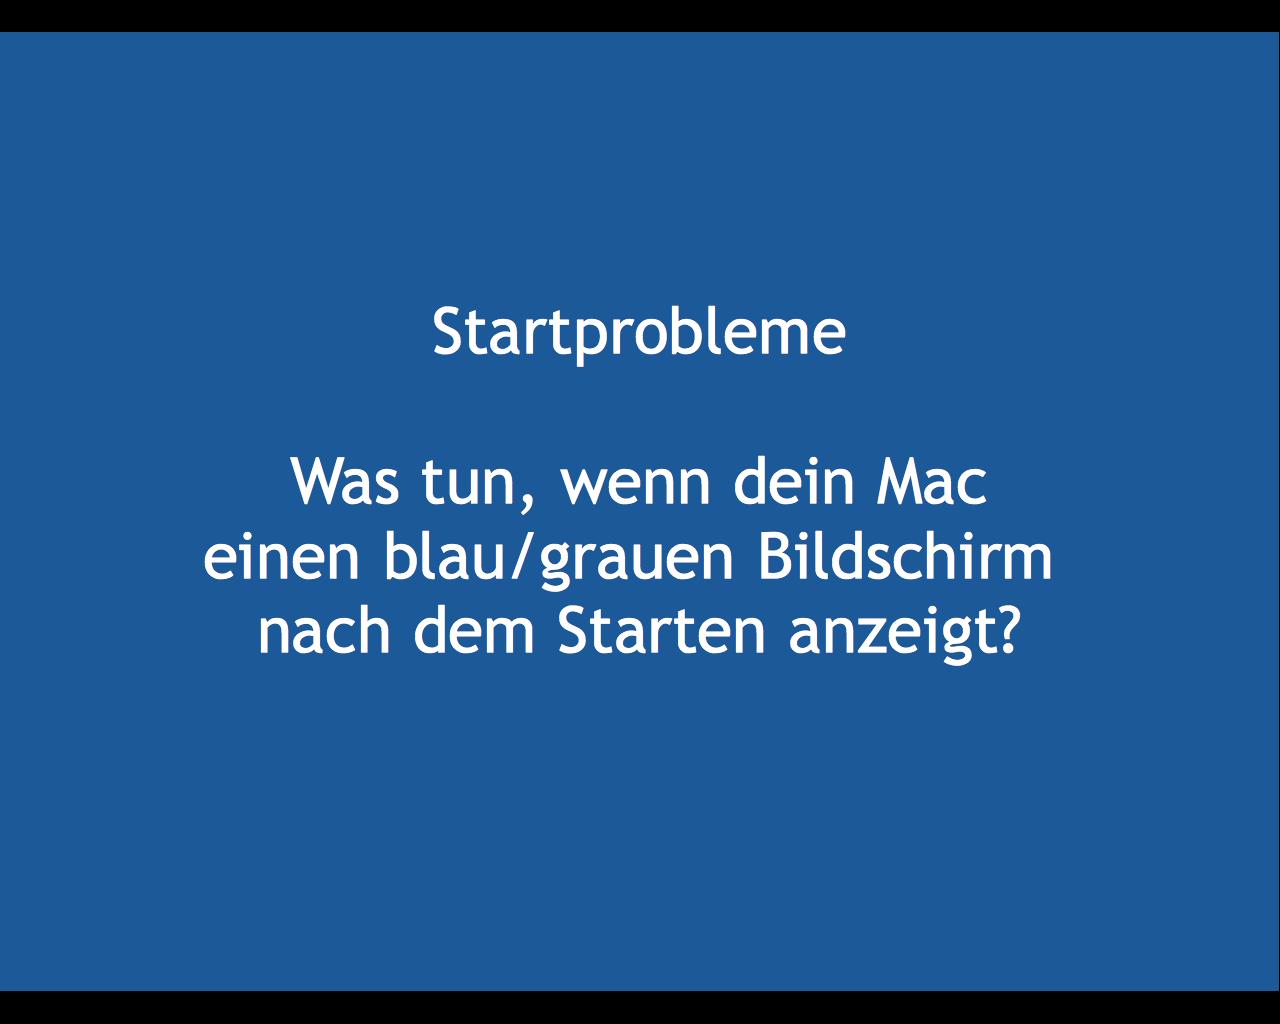 zwei macs an einem bildschirm